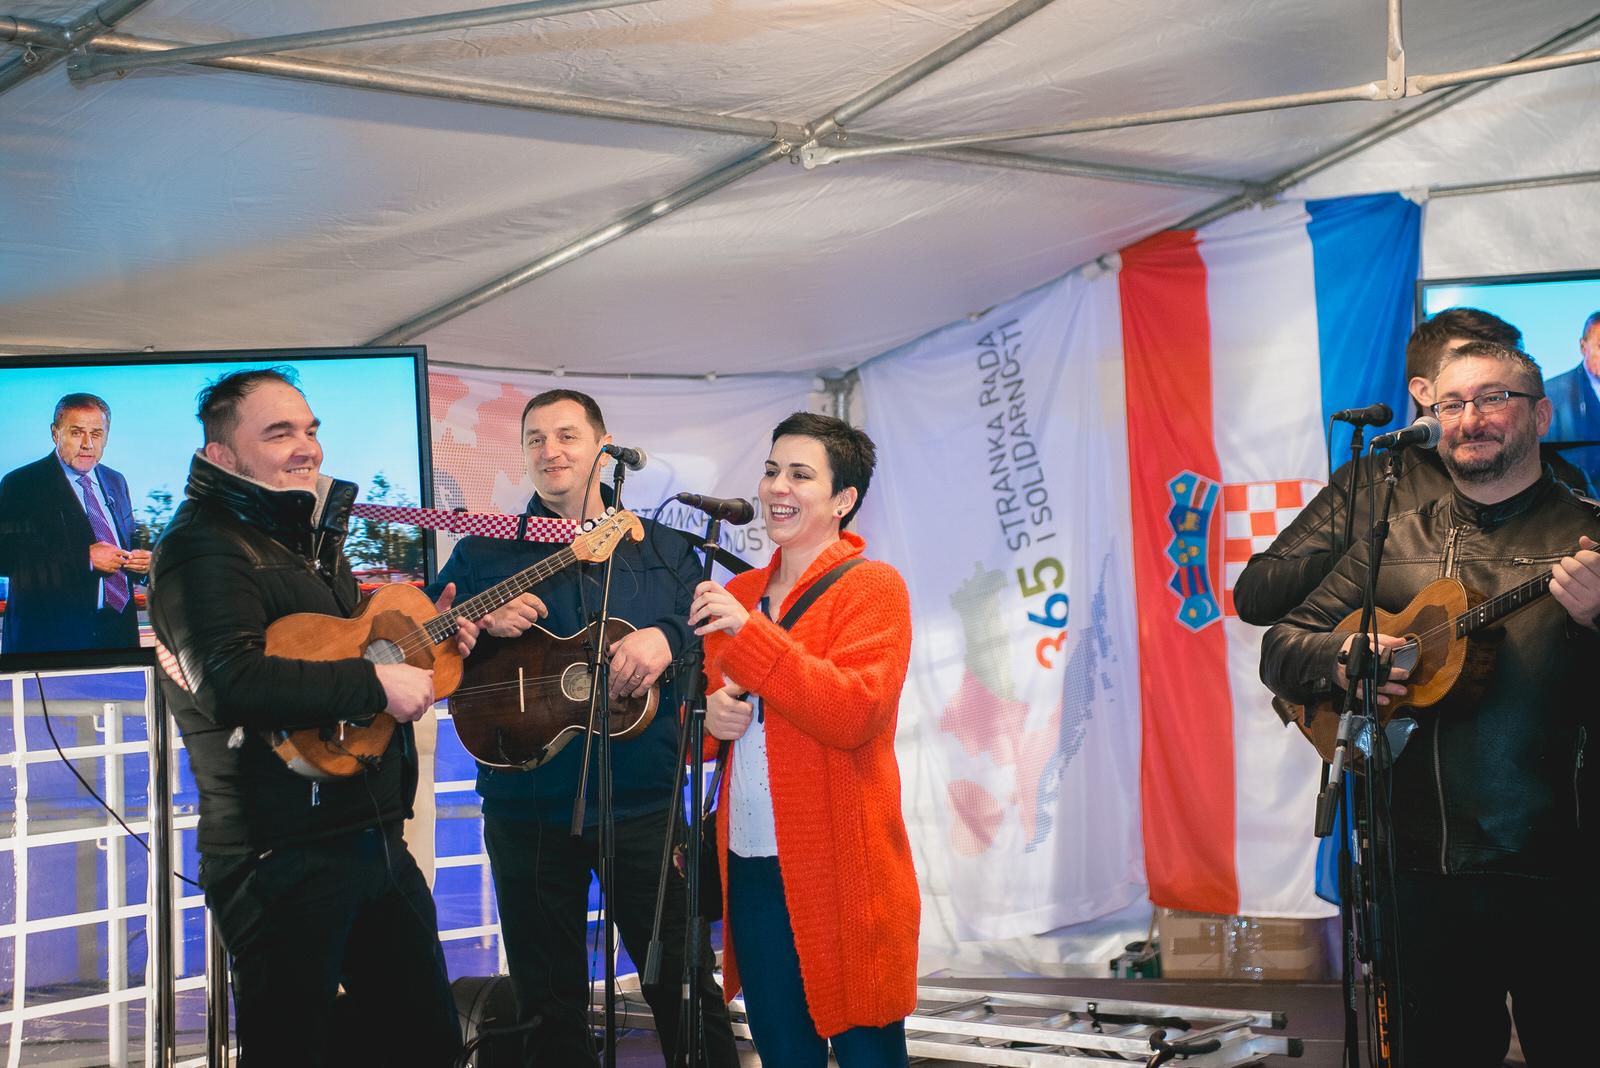 likaclub_milan-bandić-lički-osik_2019-3